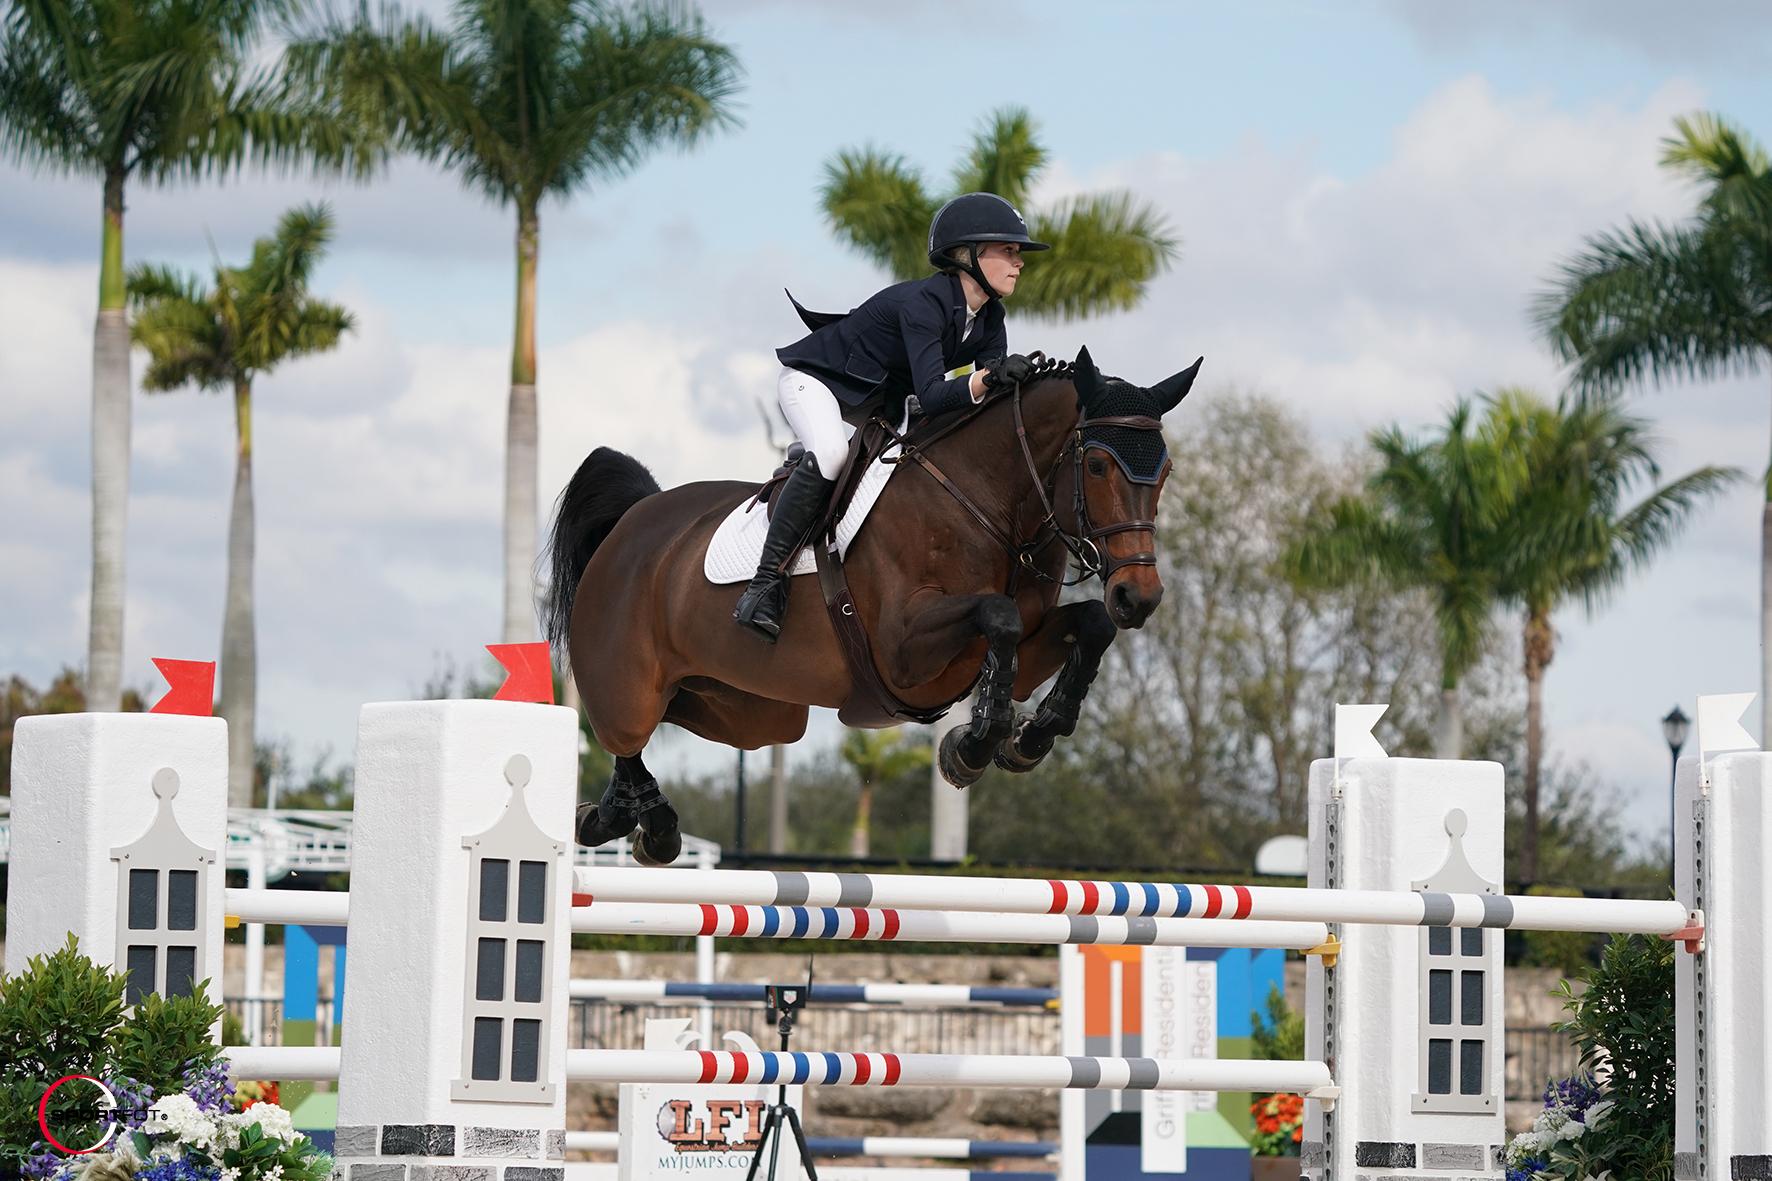 Grace-Debney-and-Zarina-de-Vidau-588_1147-Sportfot